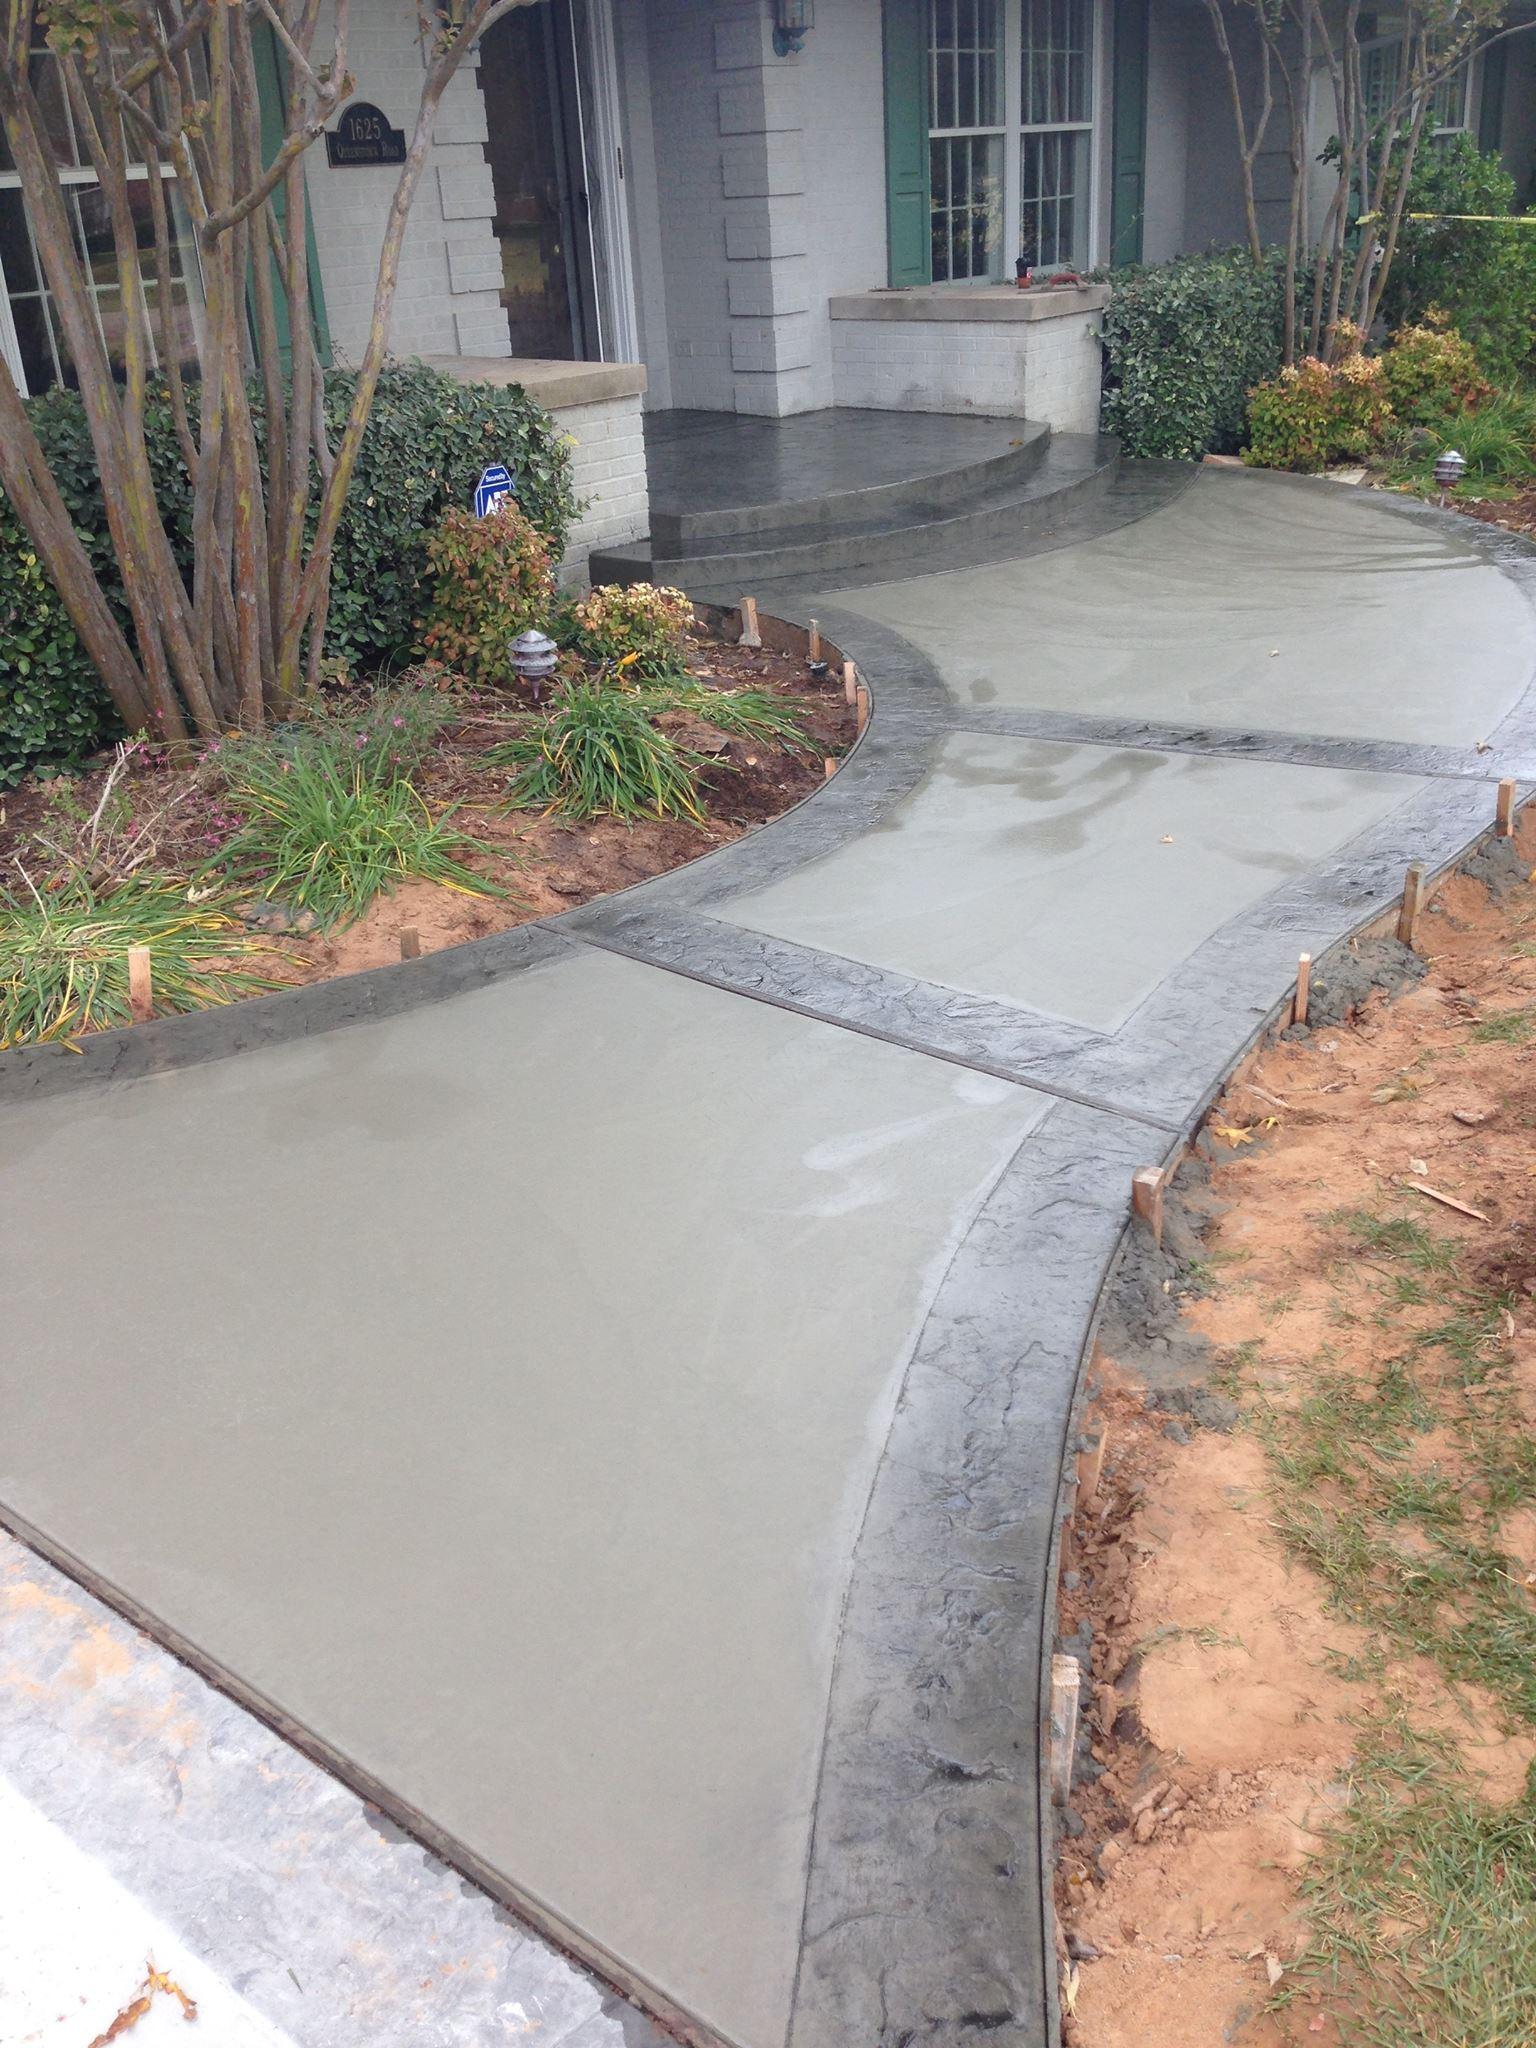 Concrete Suppliers Oklahoma City - Bill's Custom Concrete OKC